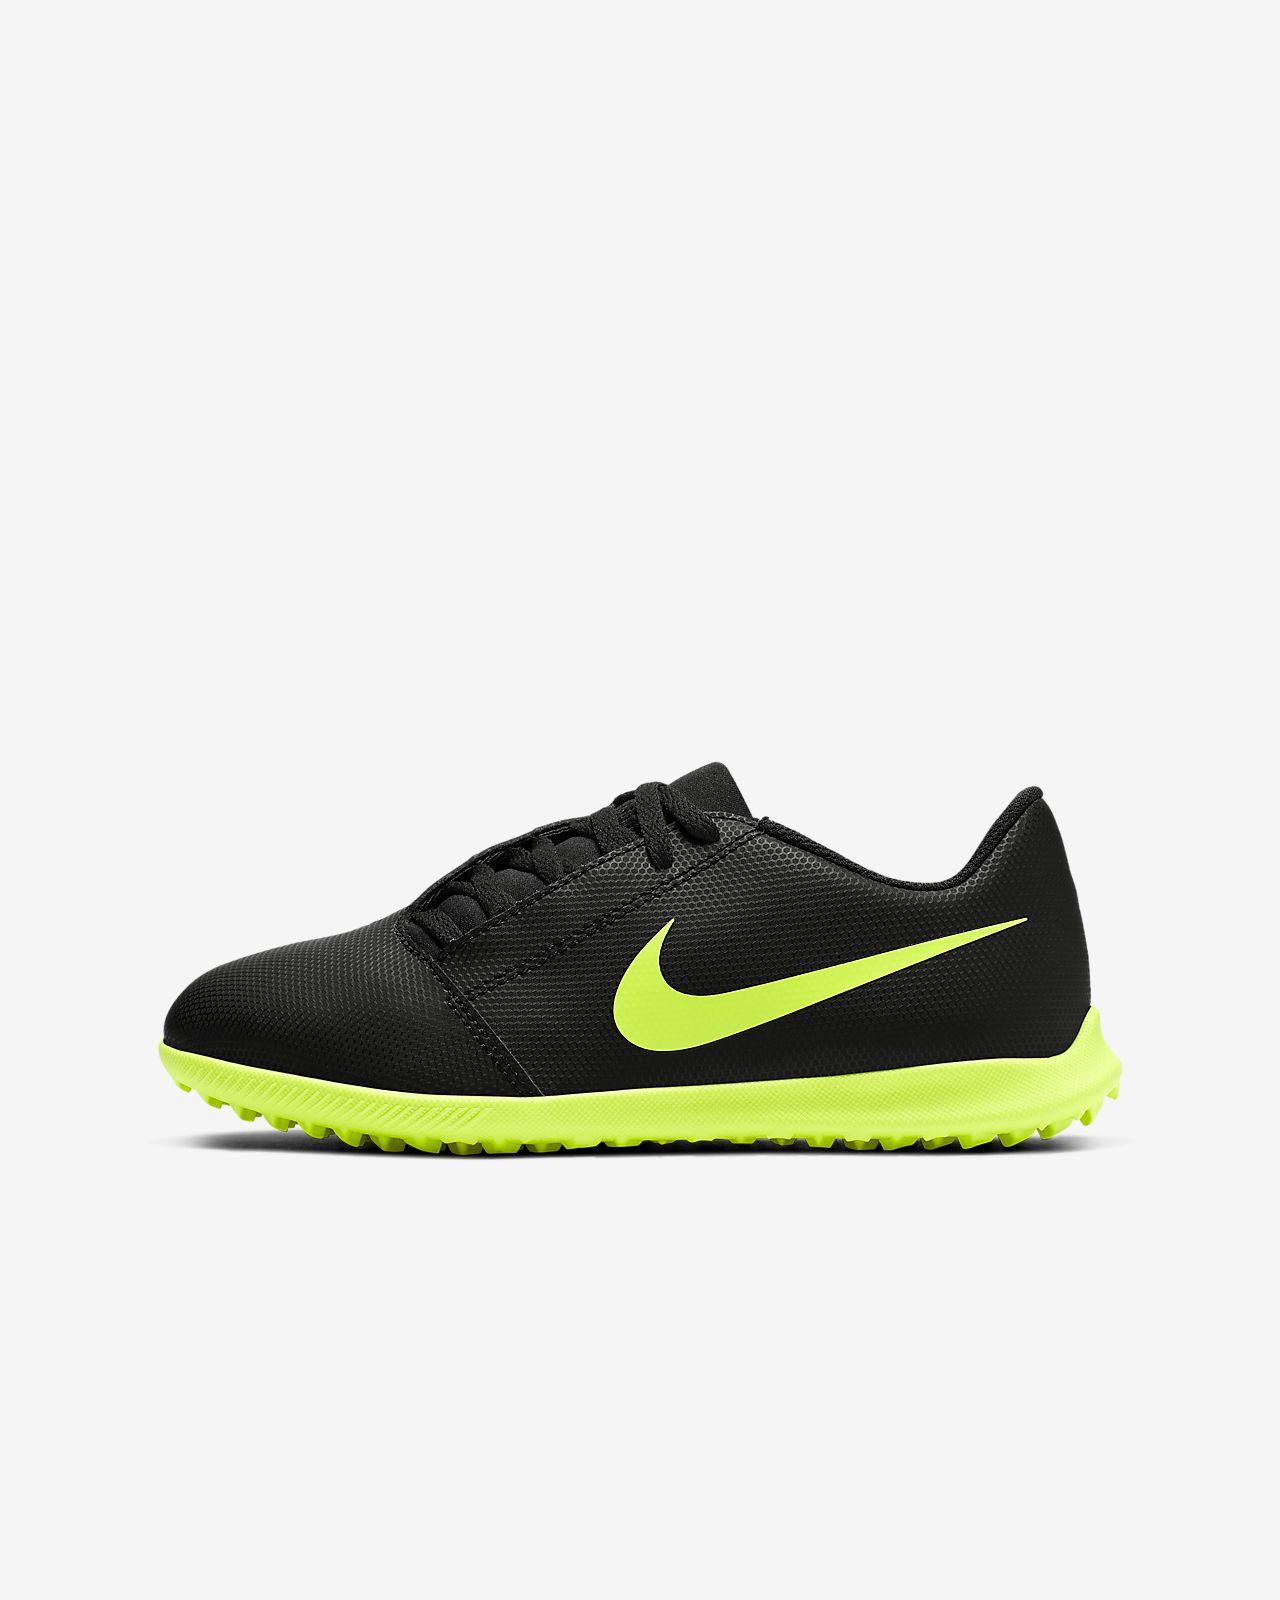 scarpe nike per erba sintetica